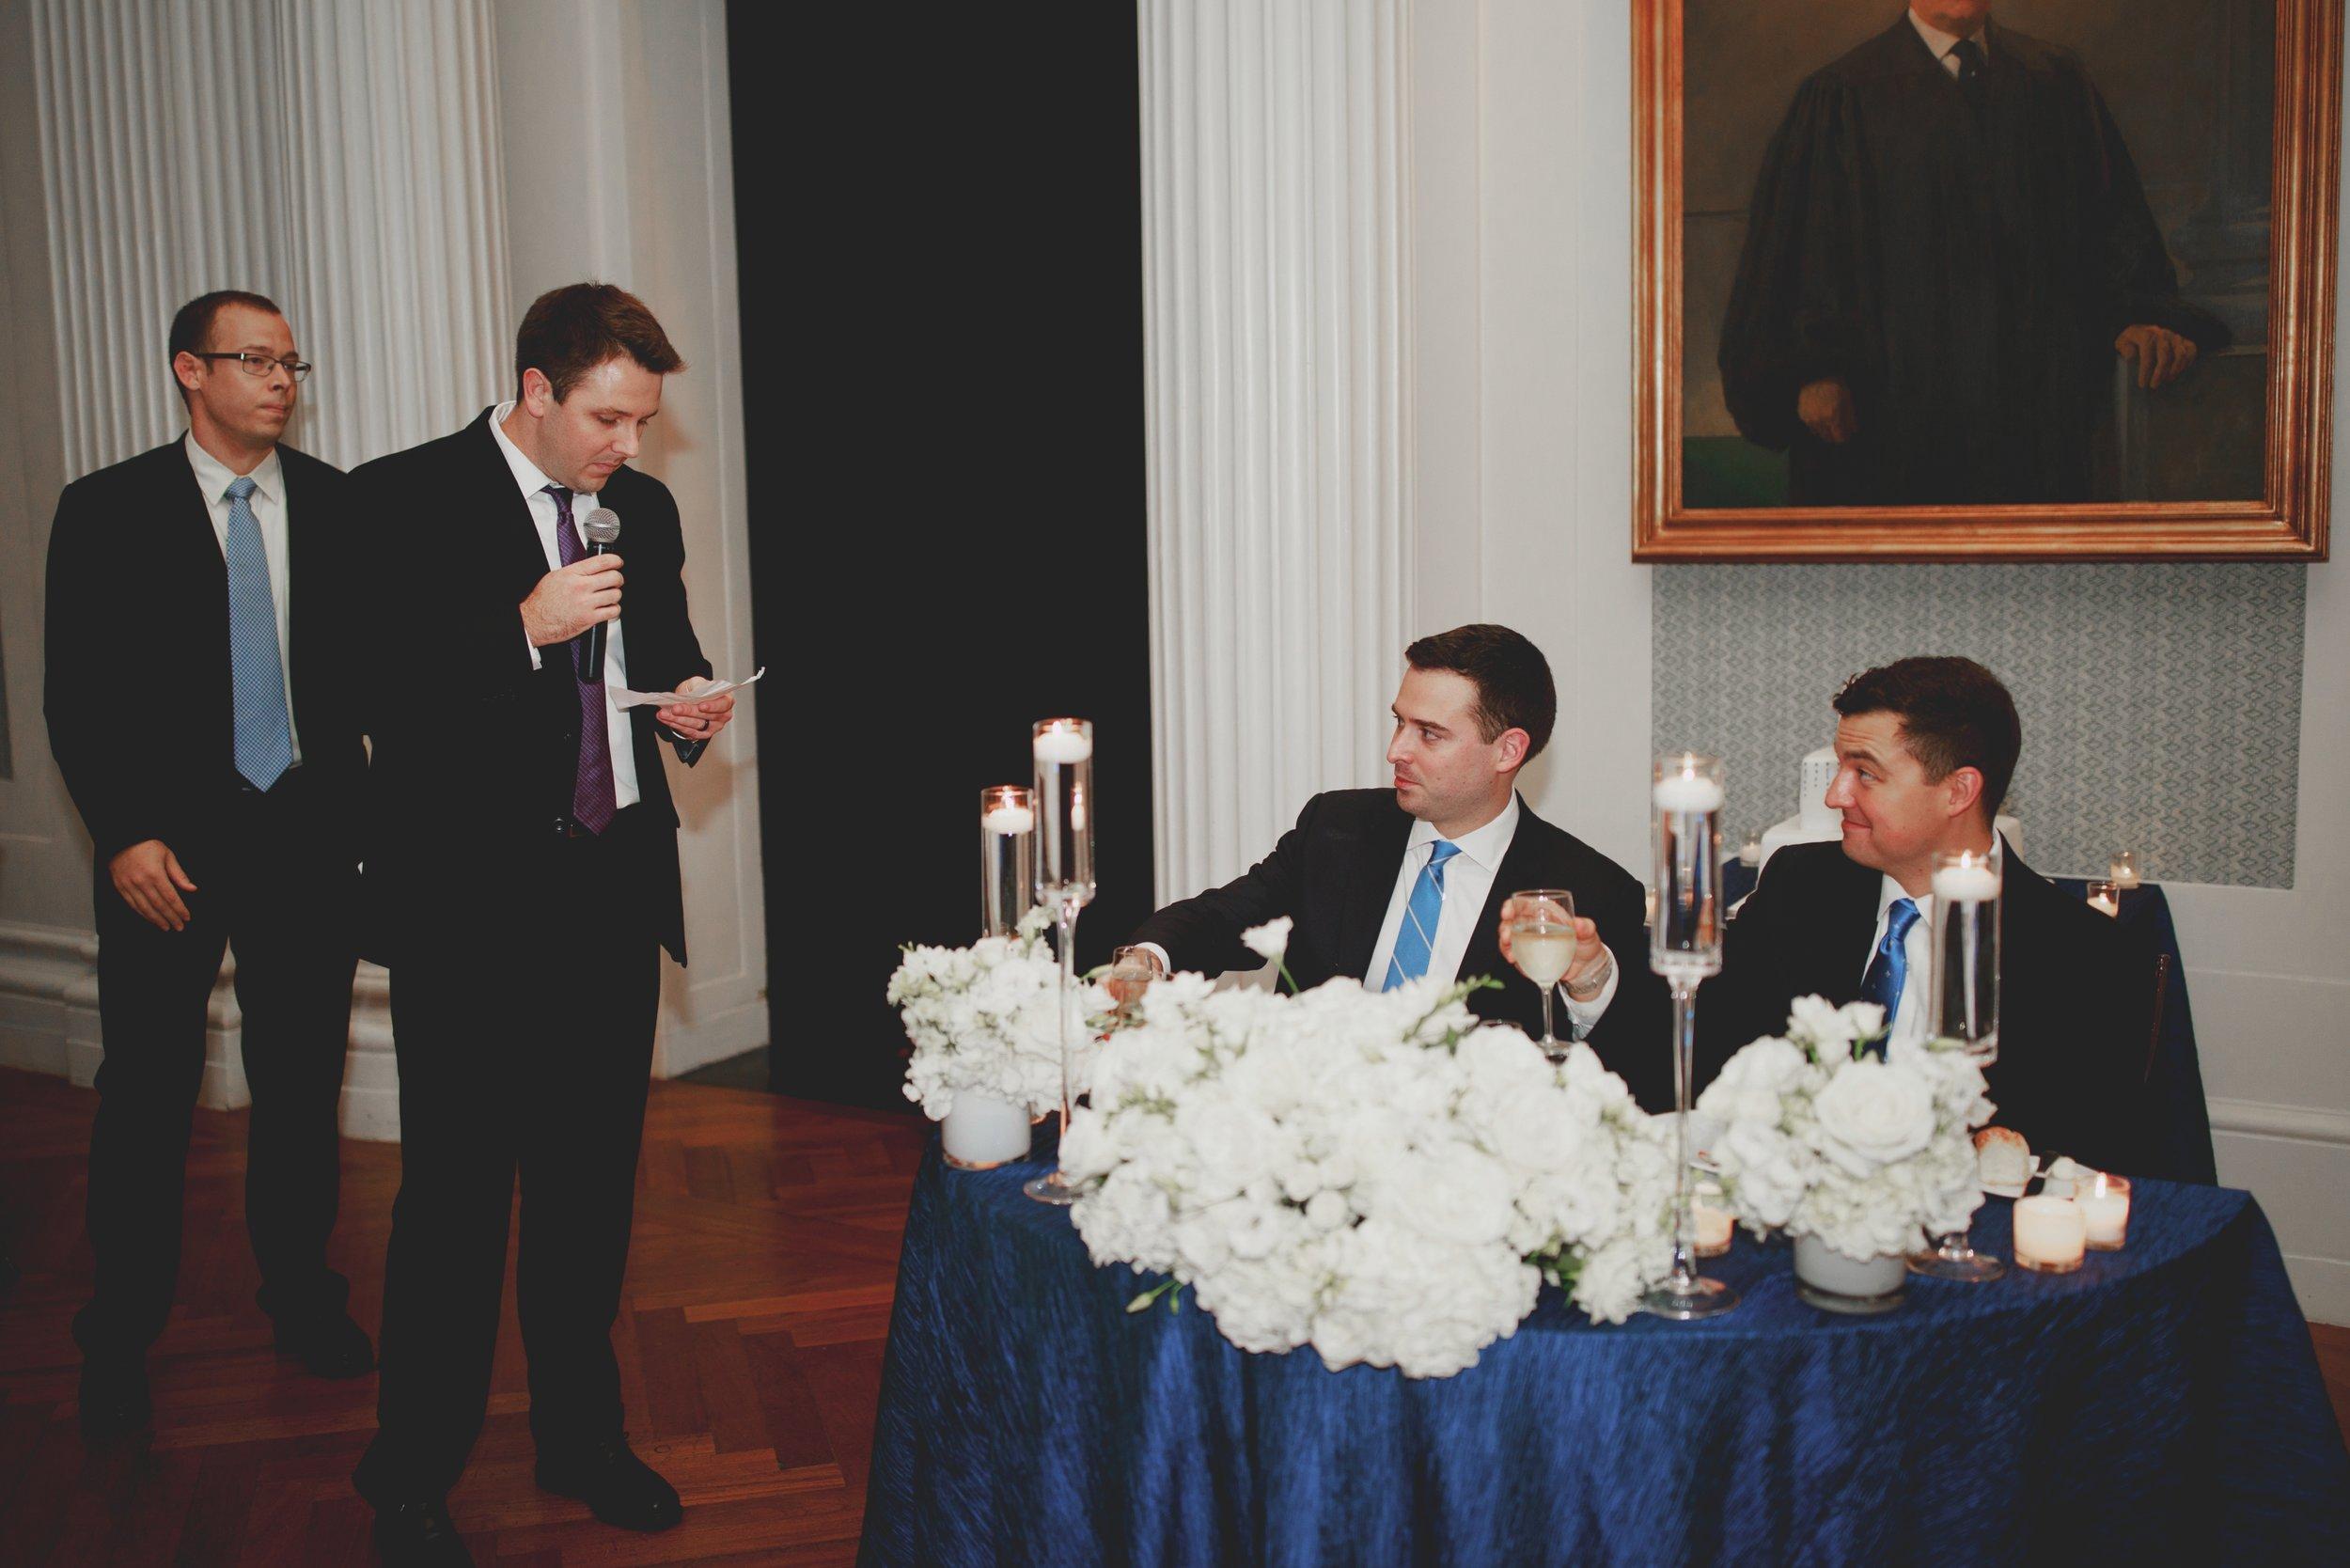 amanda_vanvels_new_york_lgbtq_gay_wedding_090.jpg